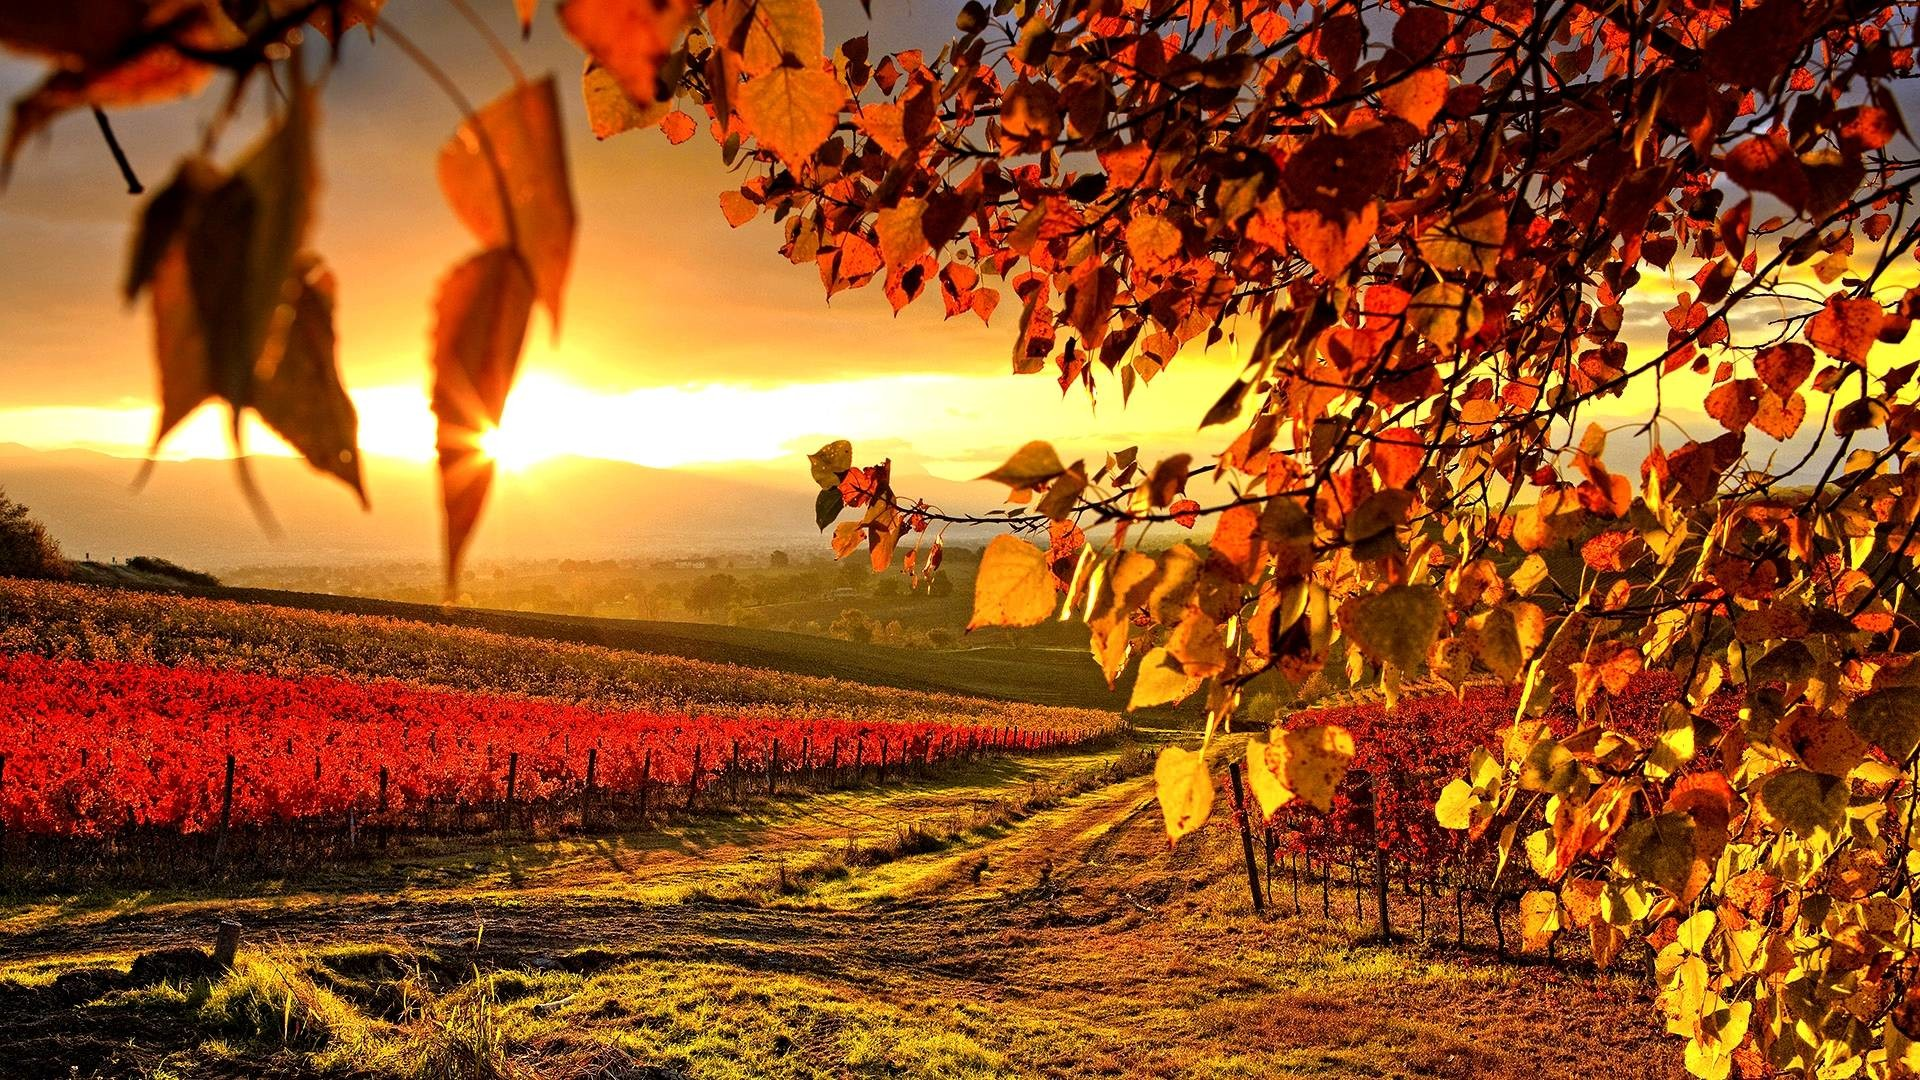 Wallpapers For > Italian Vineyard Wallpaper